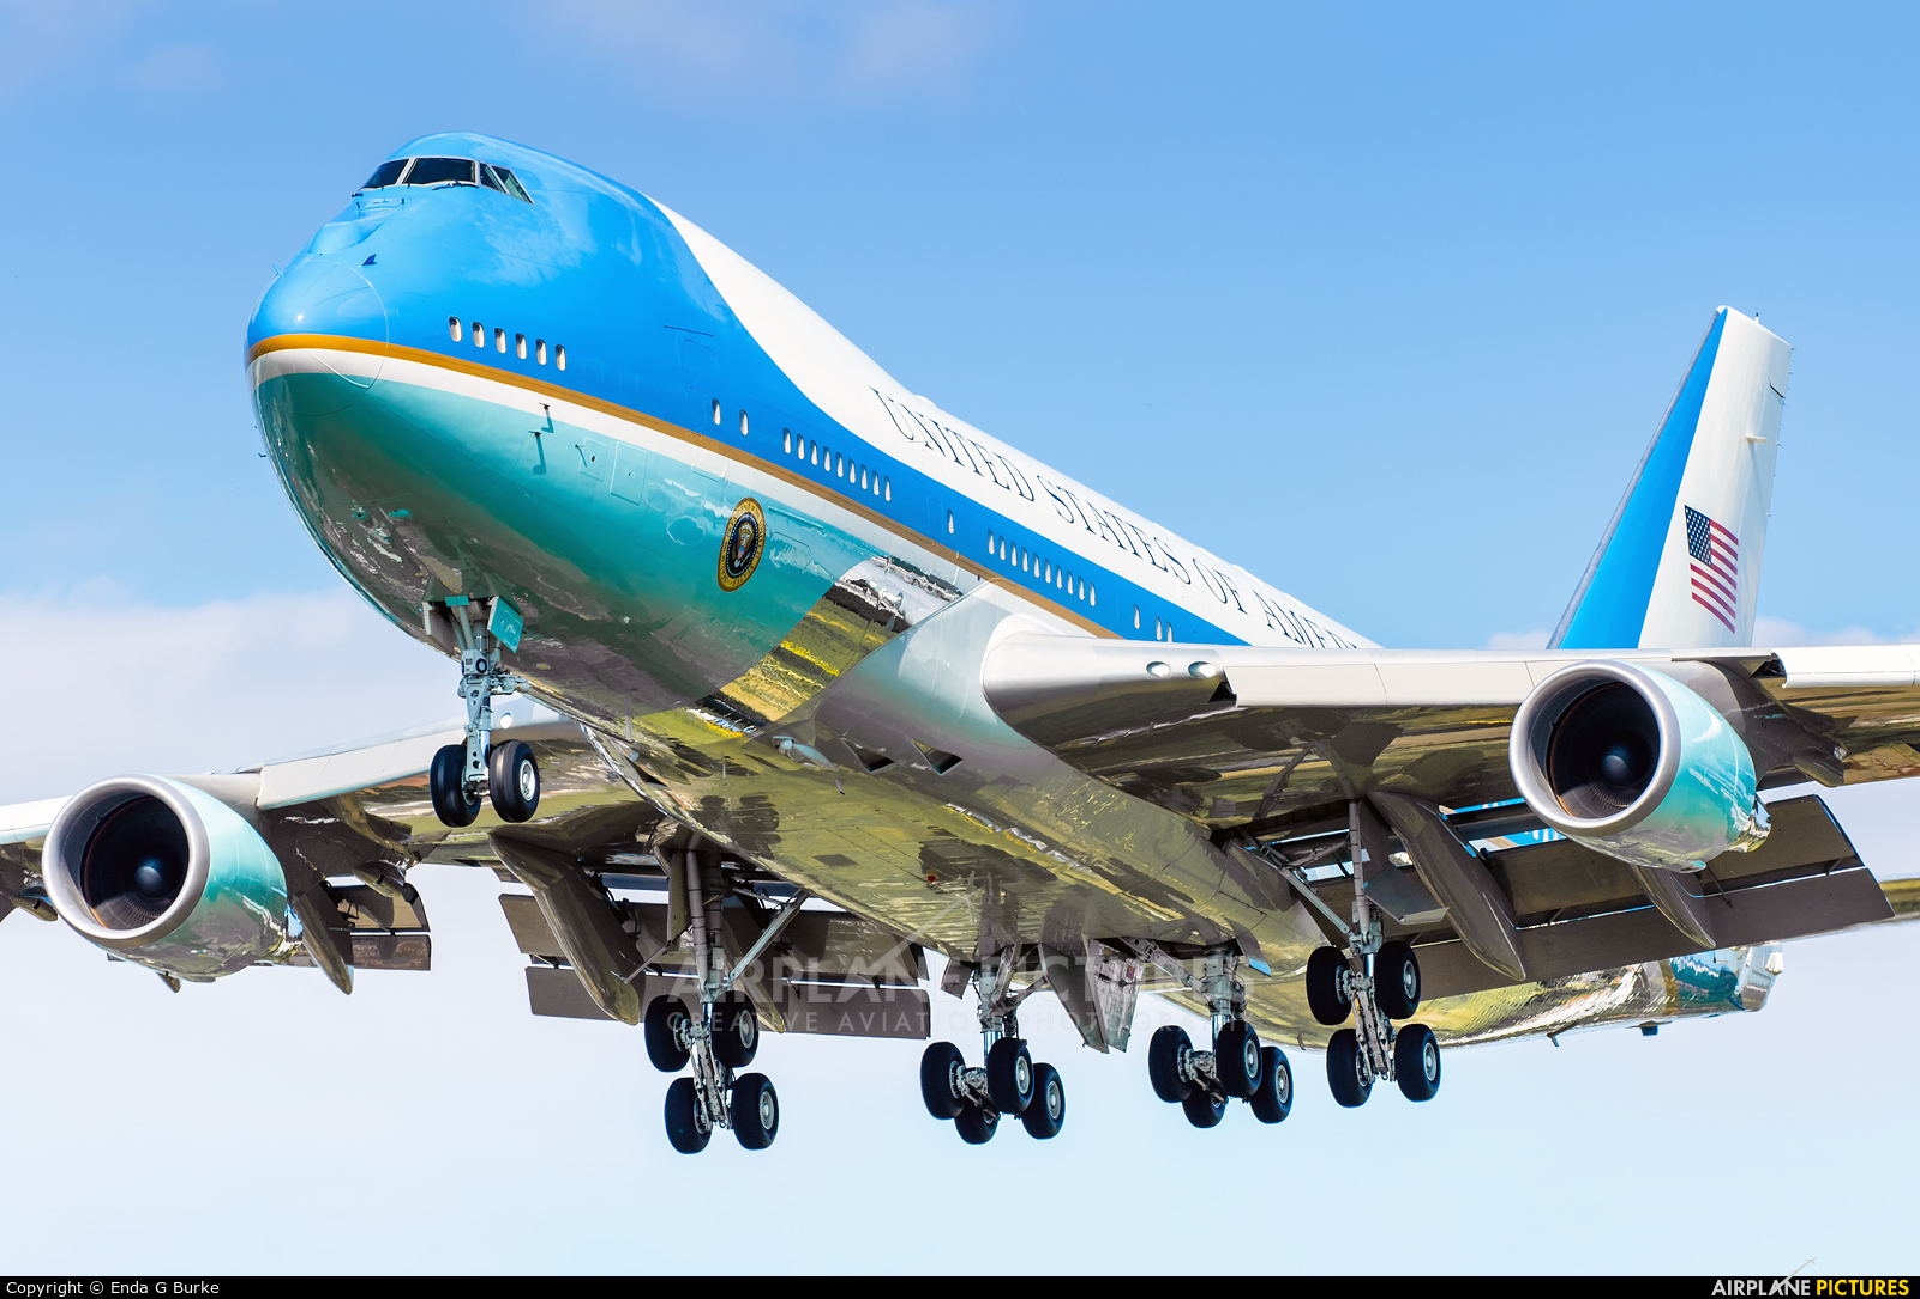 USA - Air Force 82-8000 aircraft at London - Heathrow